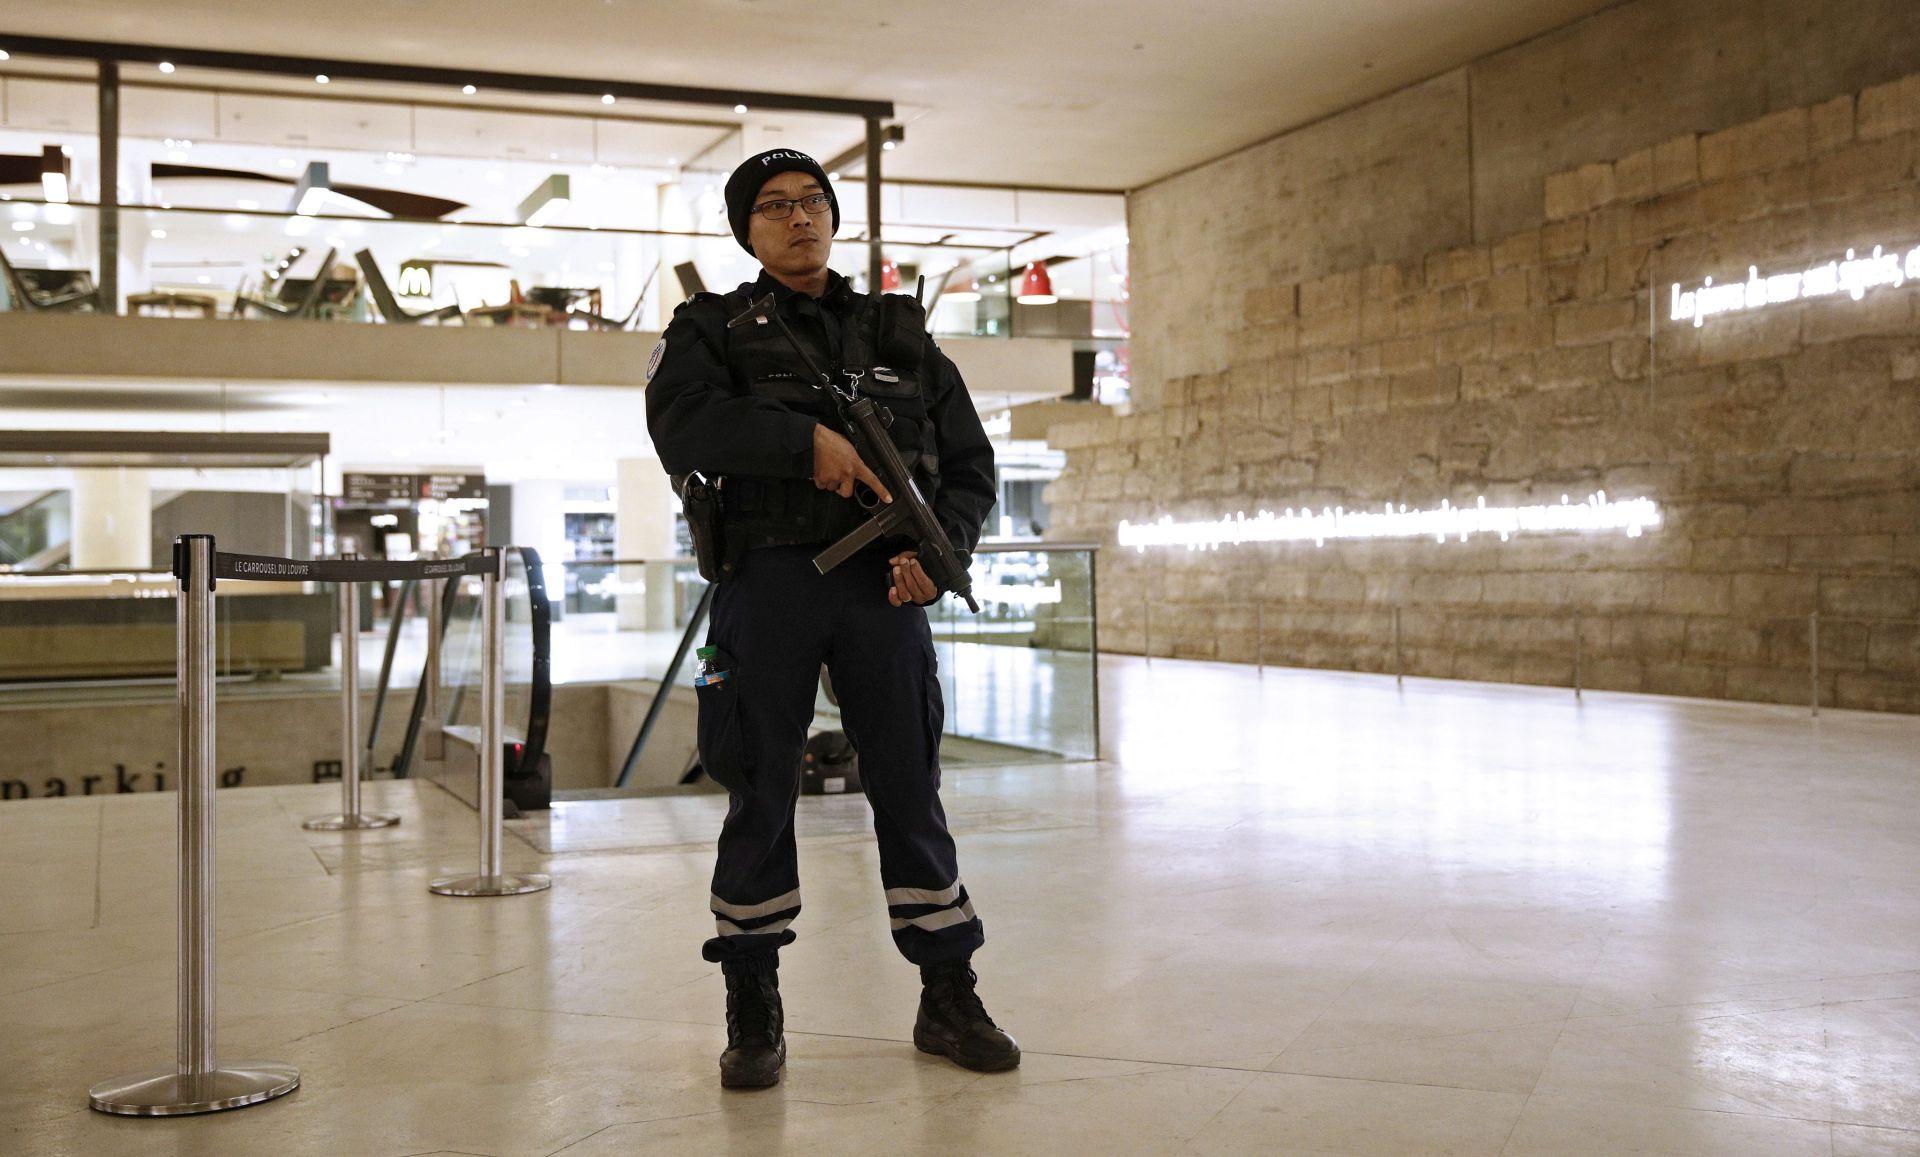 Za napad na Louvre osumnjičen 29-godišnji Egipćanin